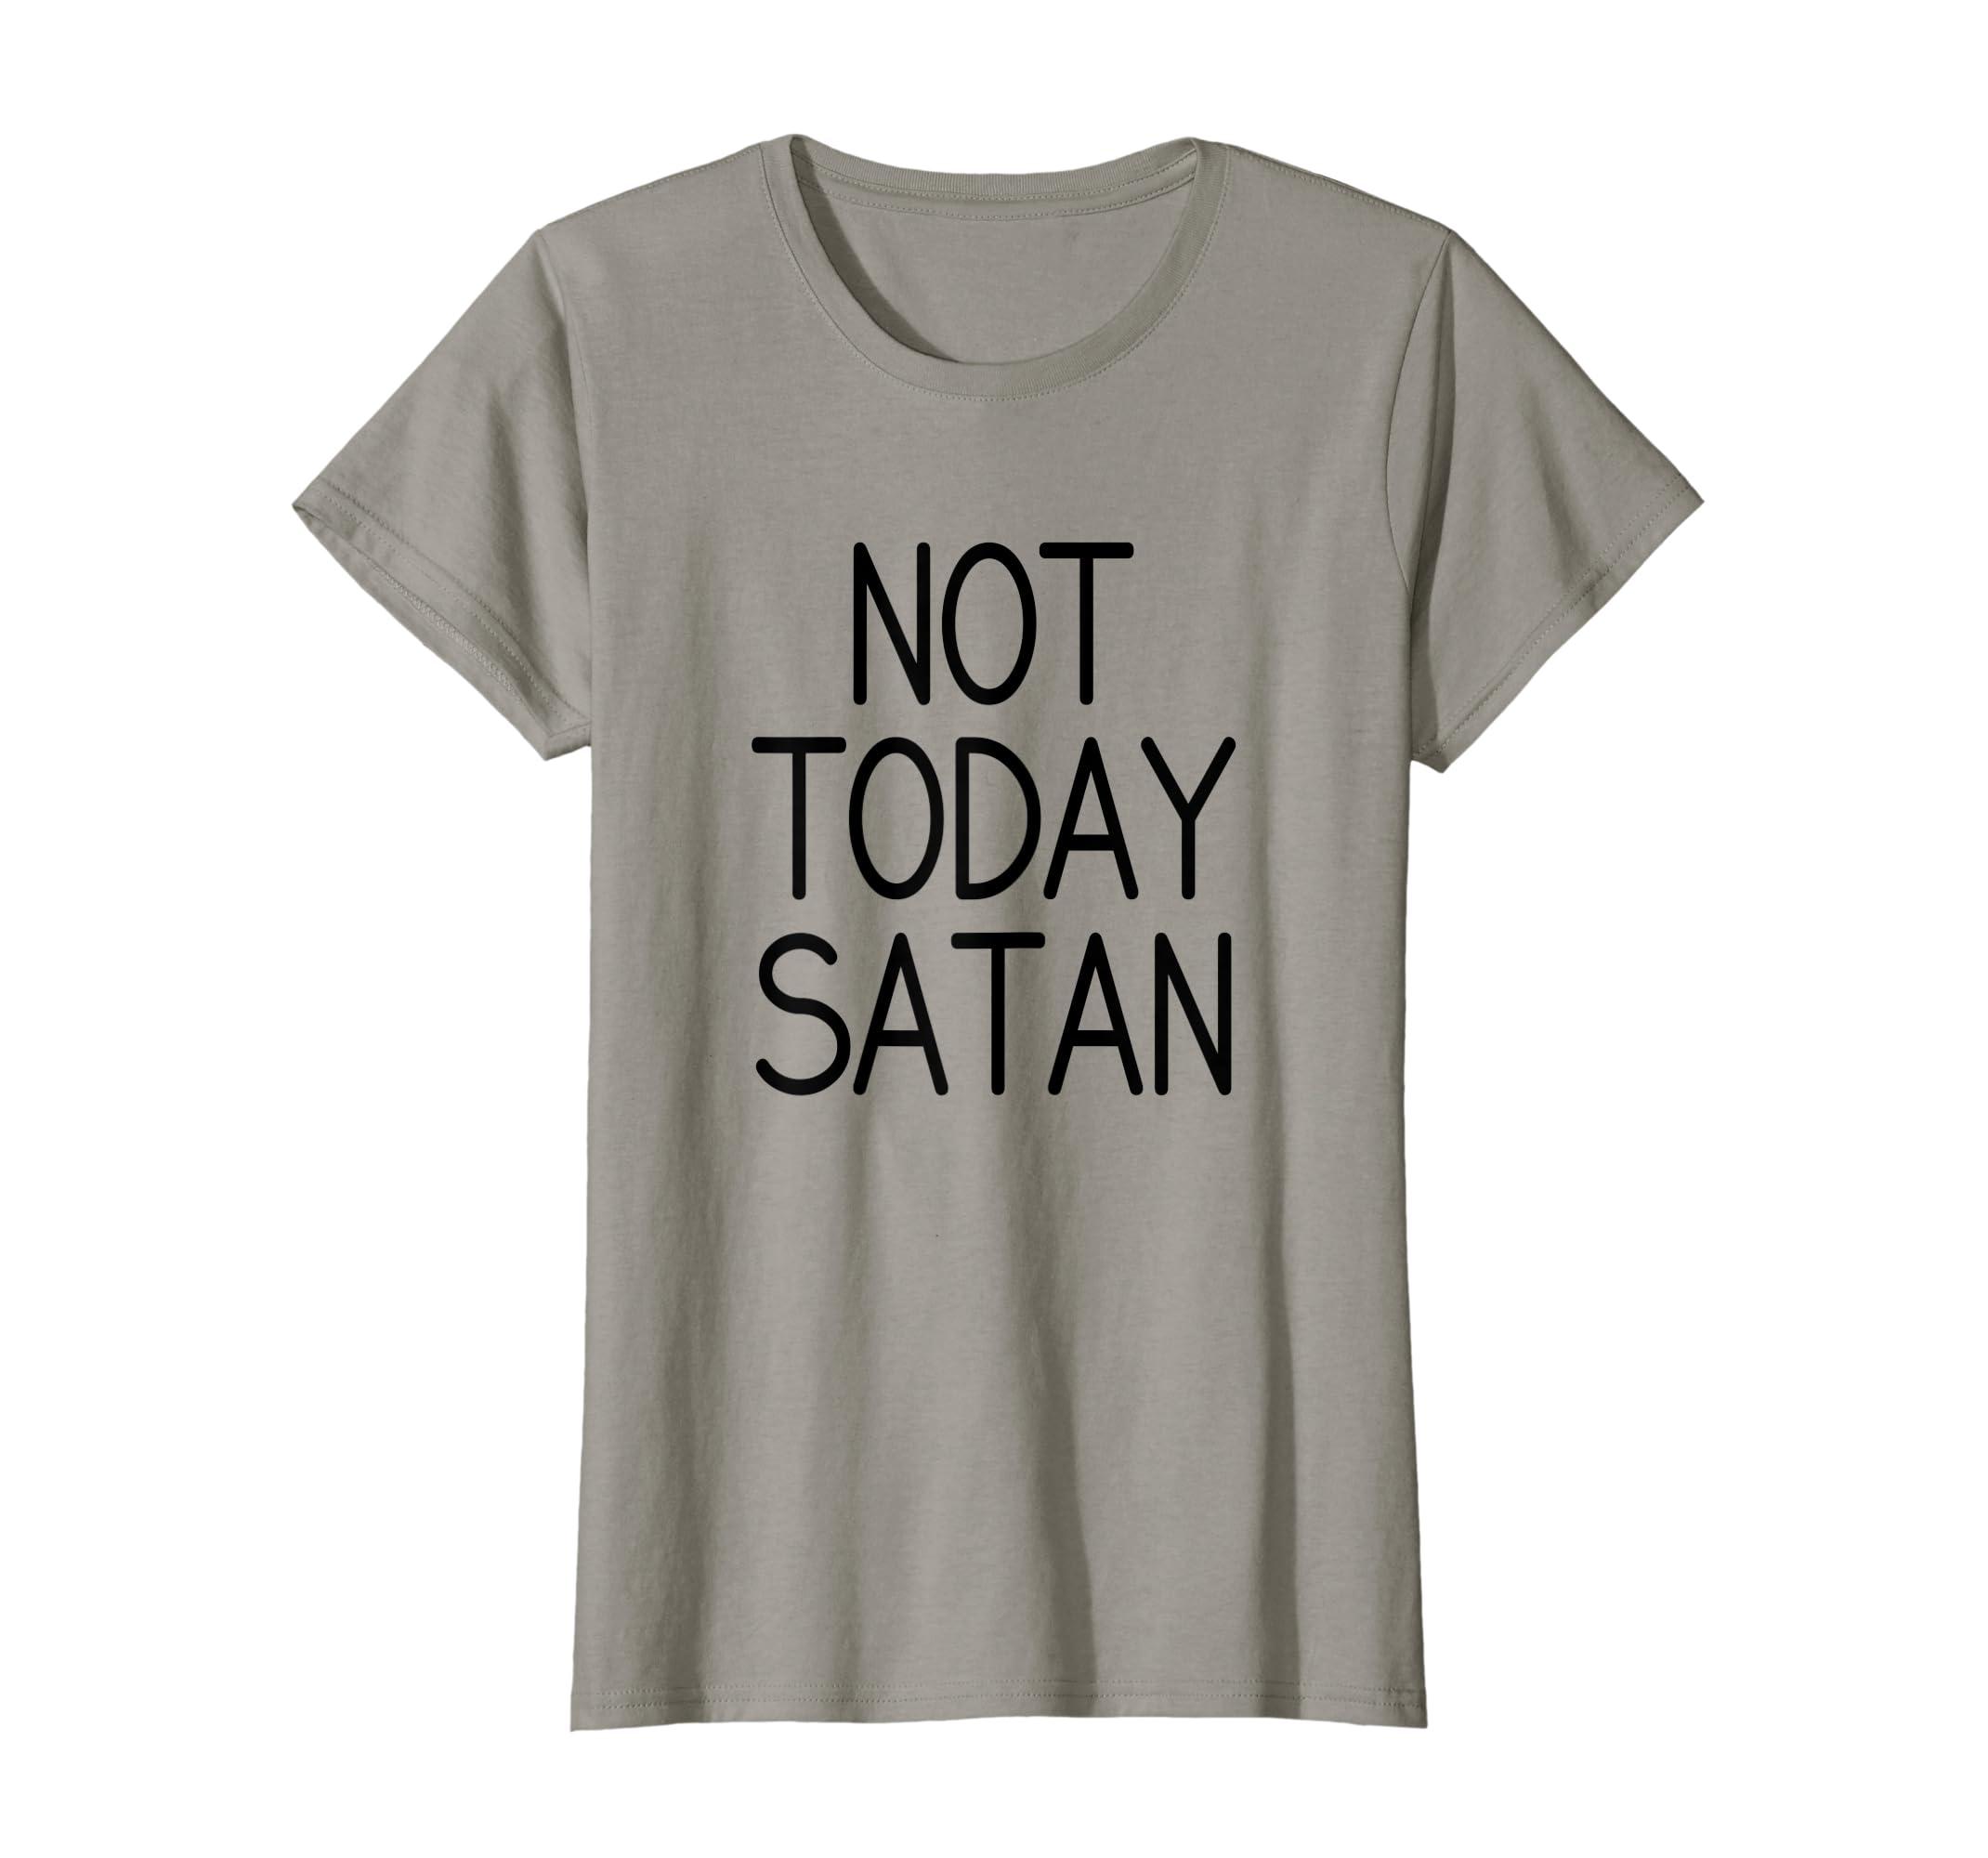 4e8edd96e Amazon.com: Not Today Satan T Shirt for Christian, Women, Men: Clothing